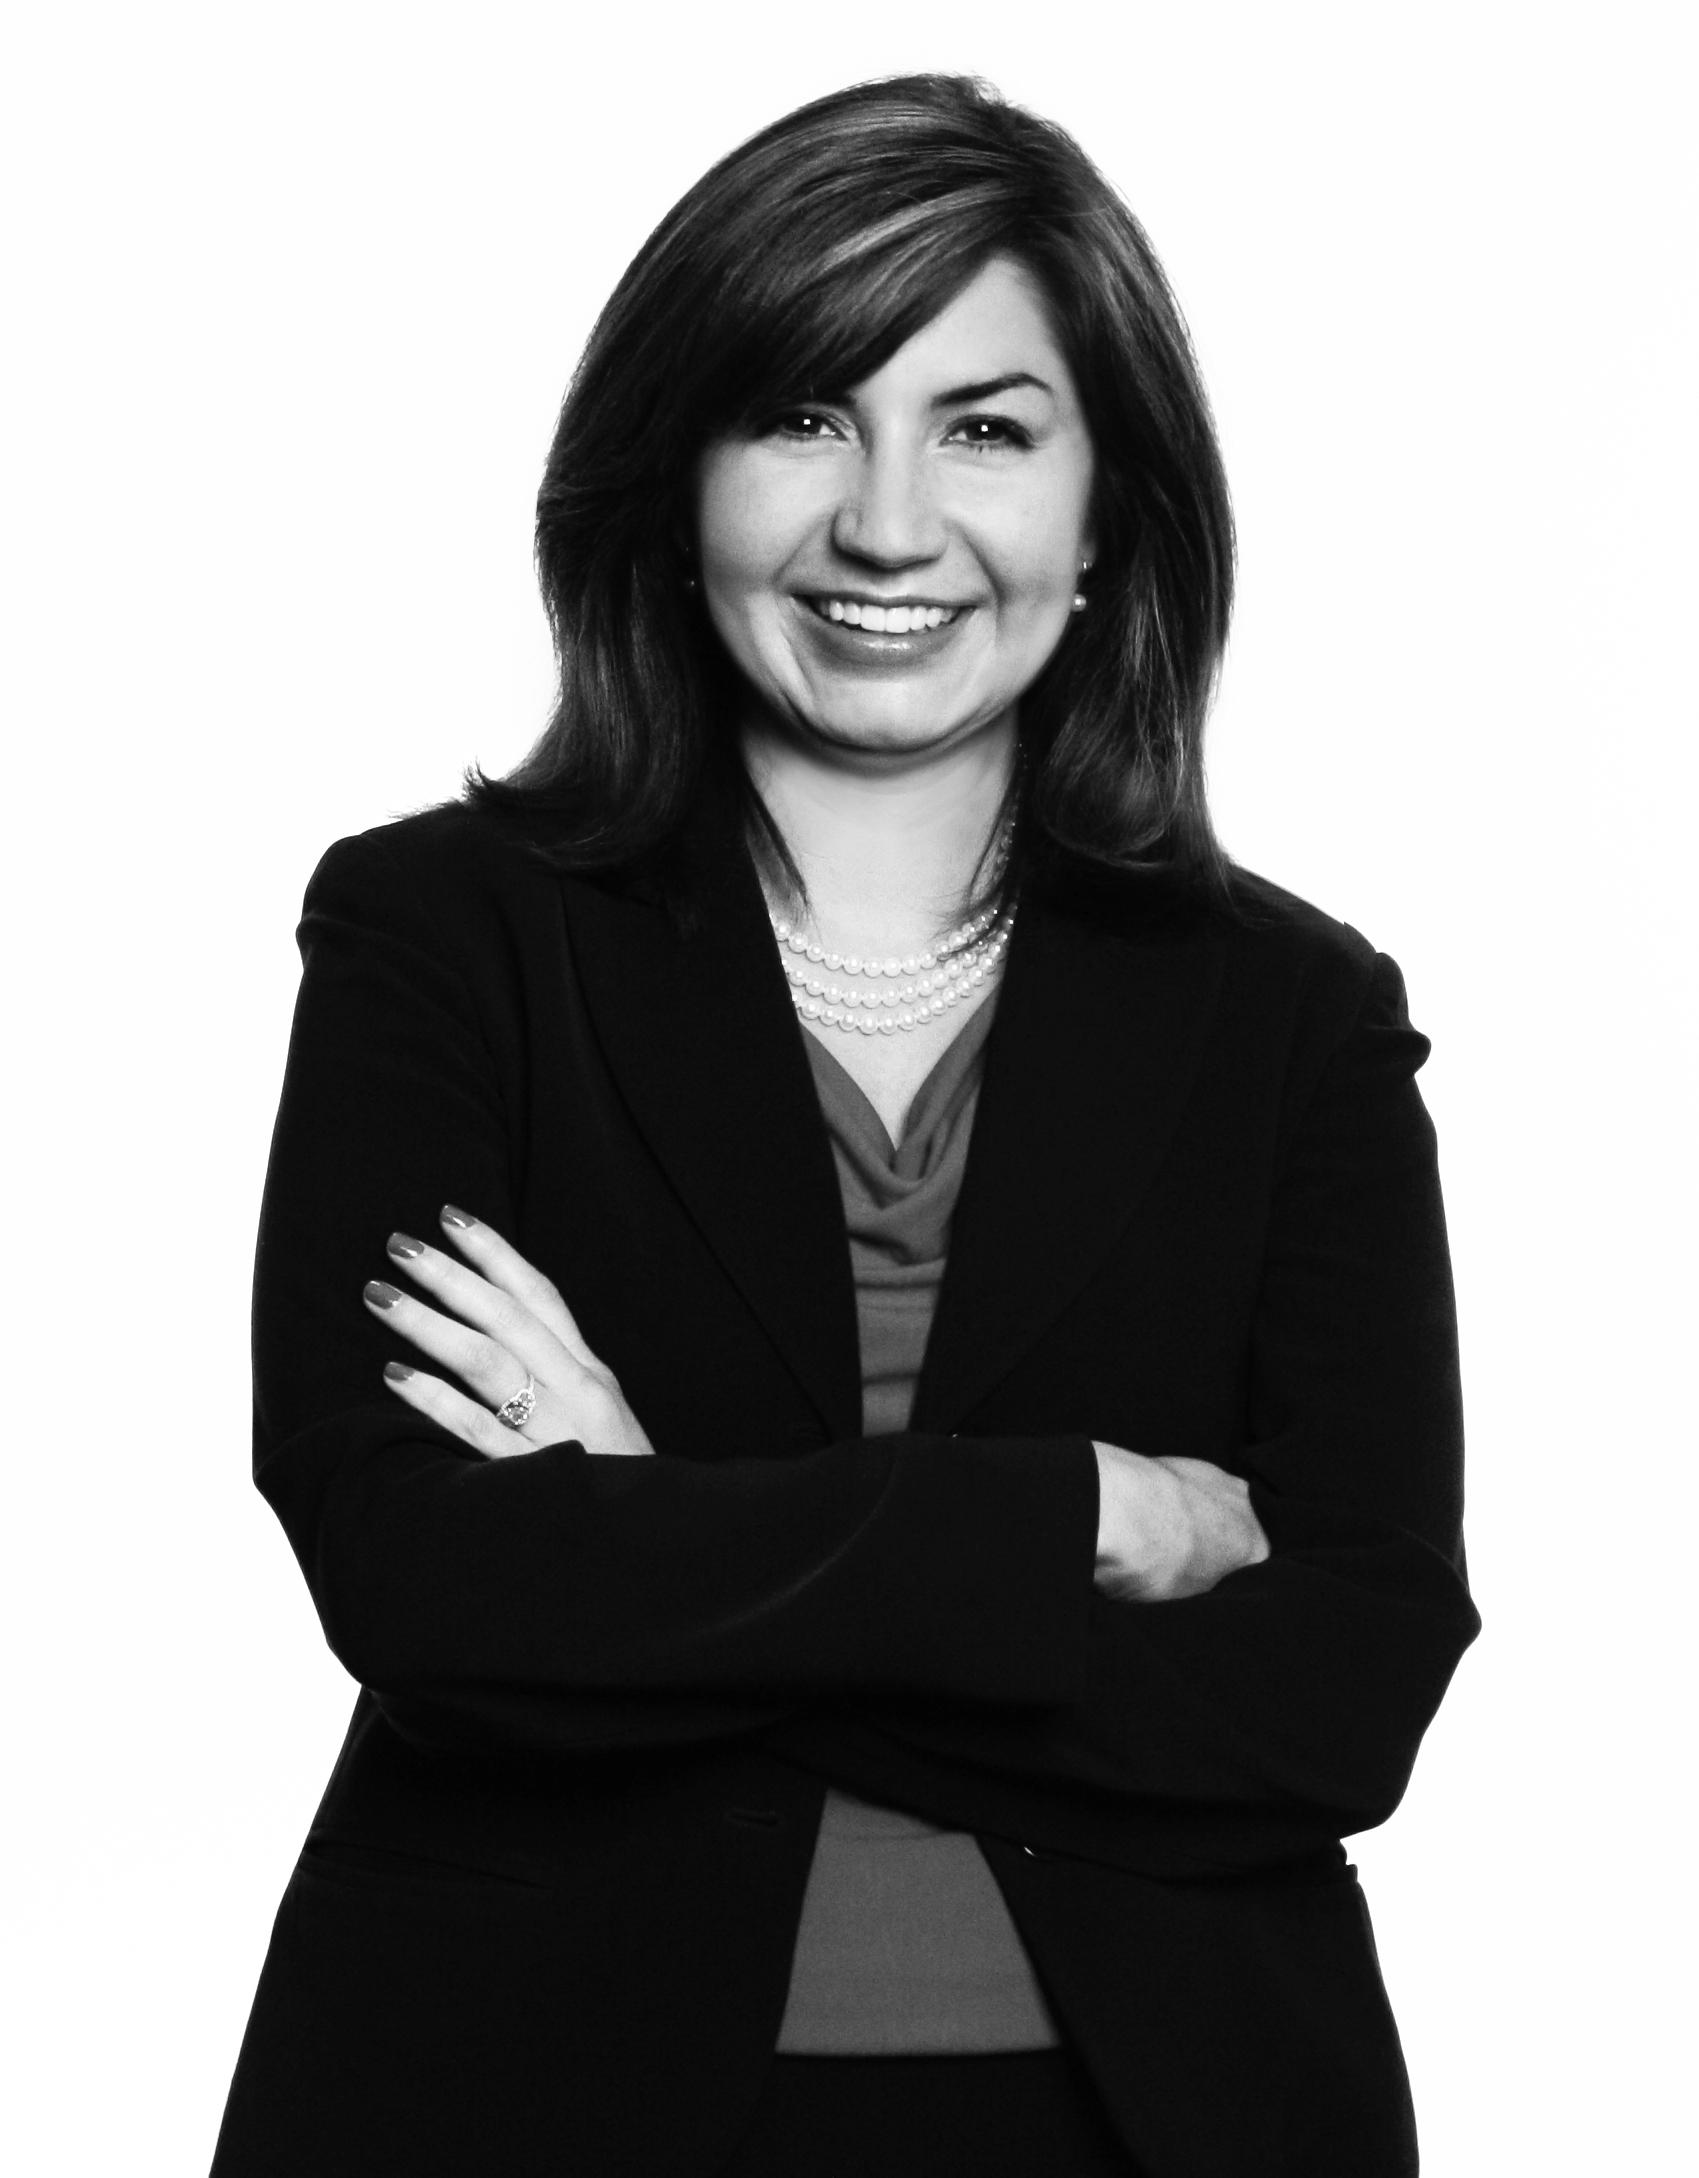 Veronica Villalobos